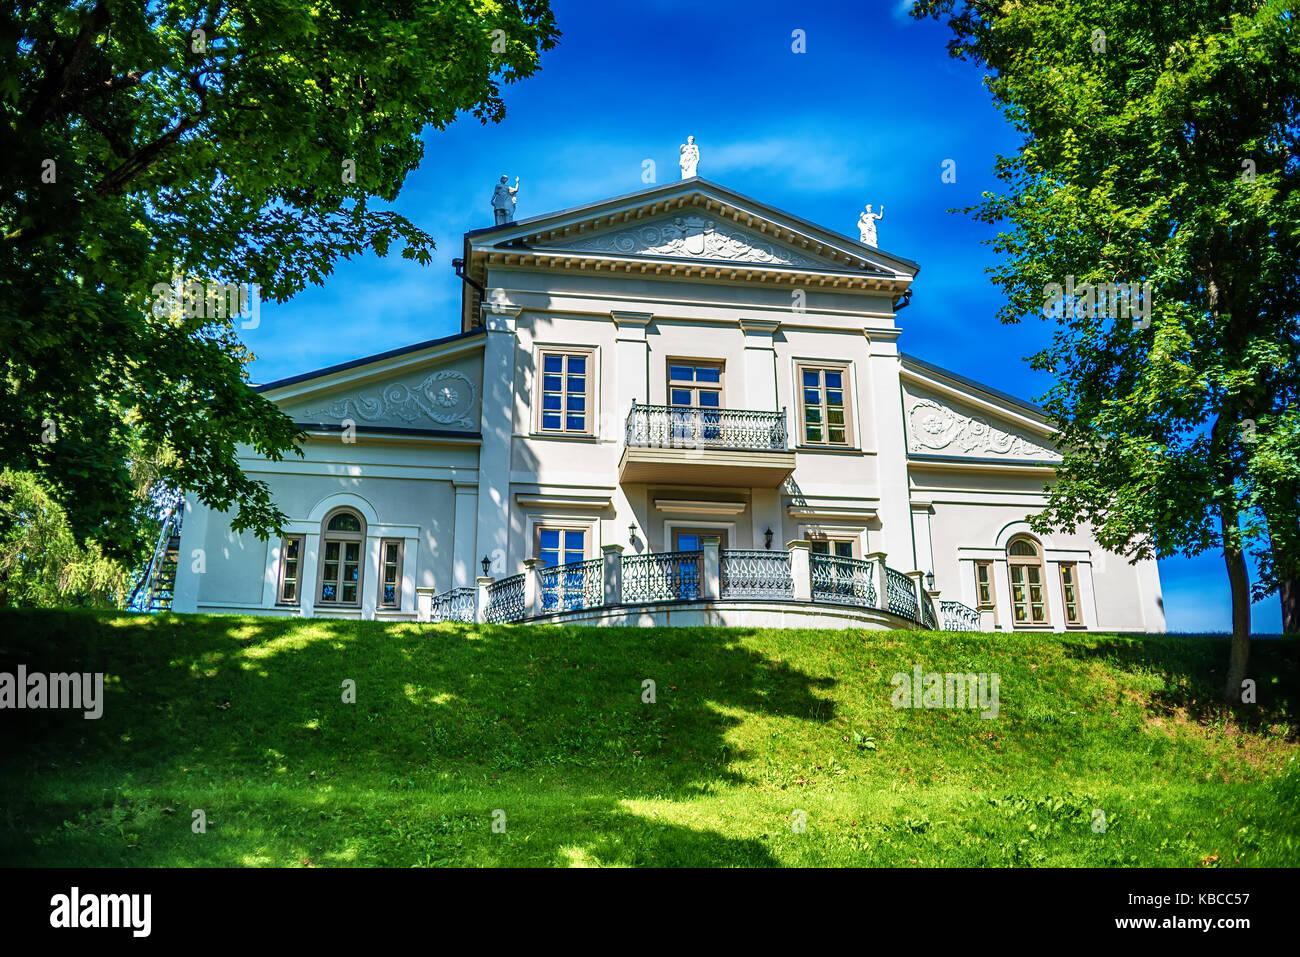 Vilnius, Lithuania: The Memorial Complex of the Tuskulenai Peace Park, where the victims of 1944-1947 soviet NKVD - Stock Image